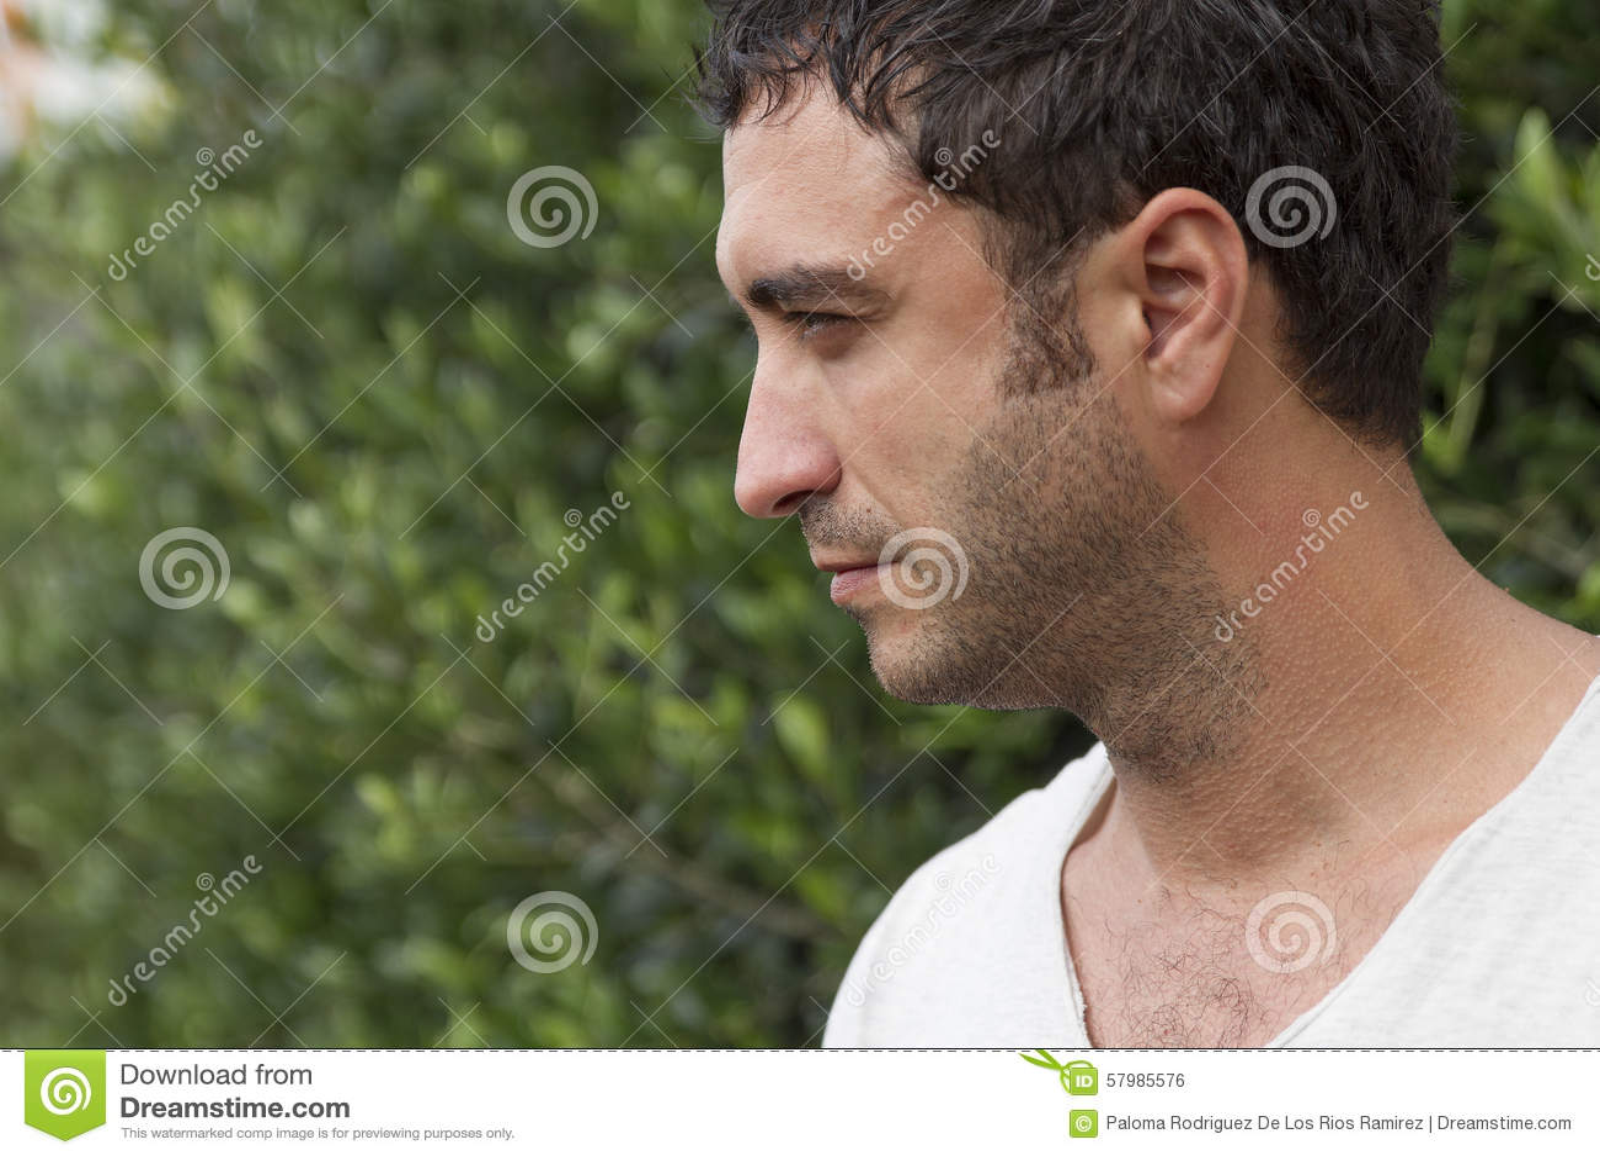 Attractive profile pictures